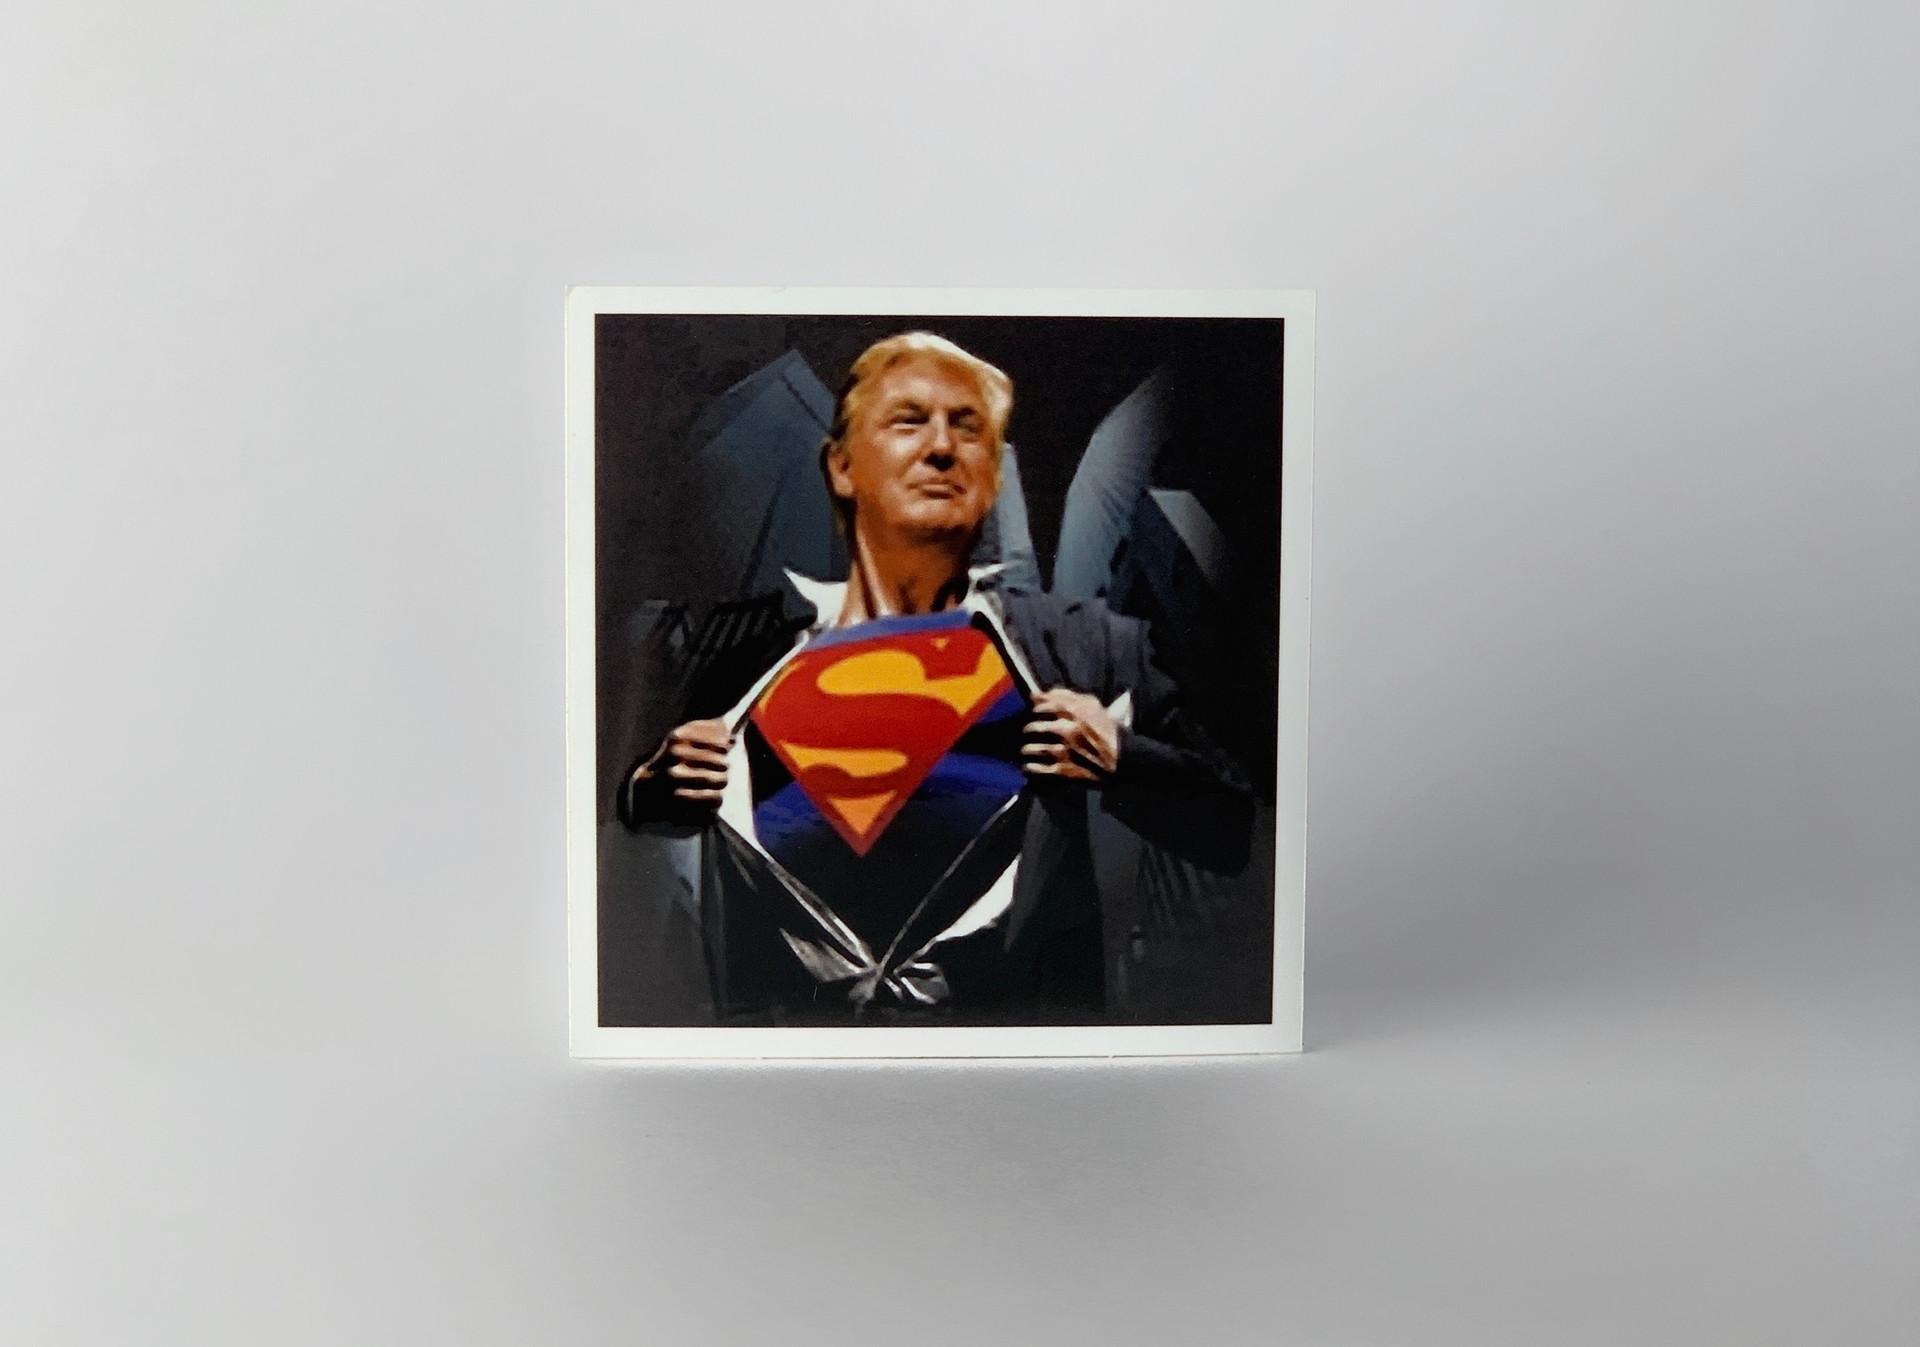 Trump as Superman